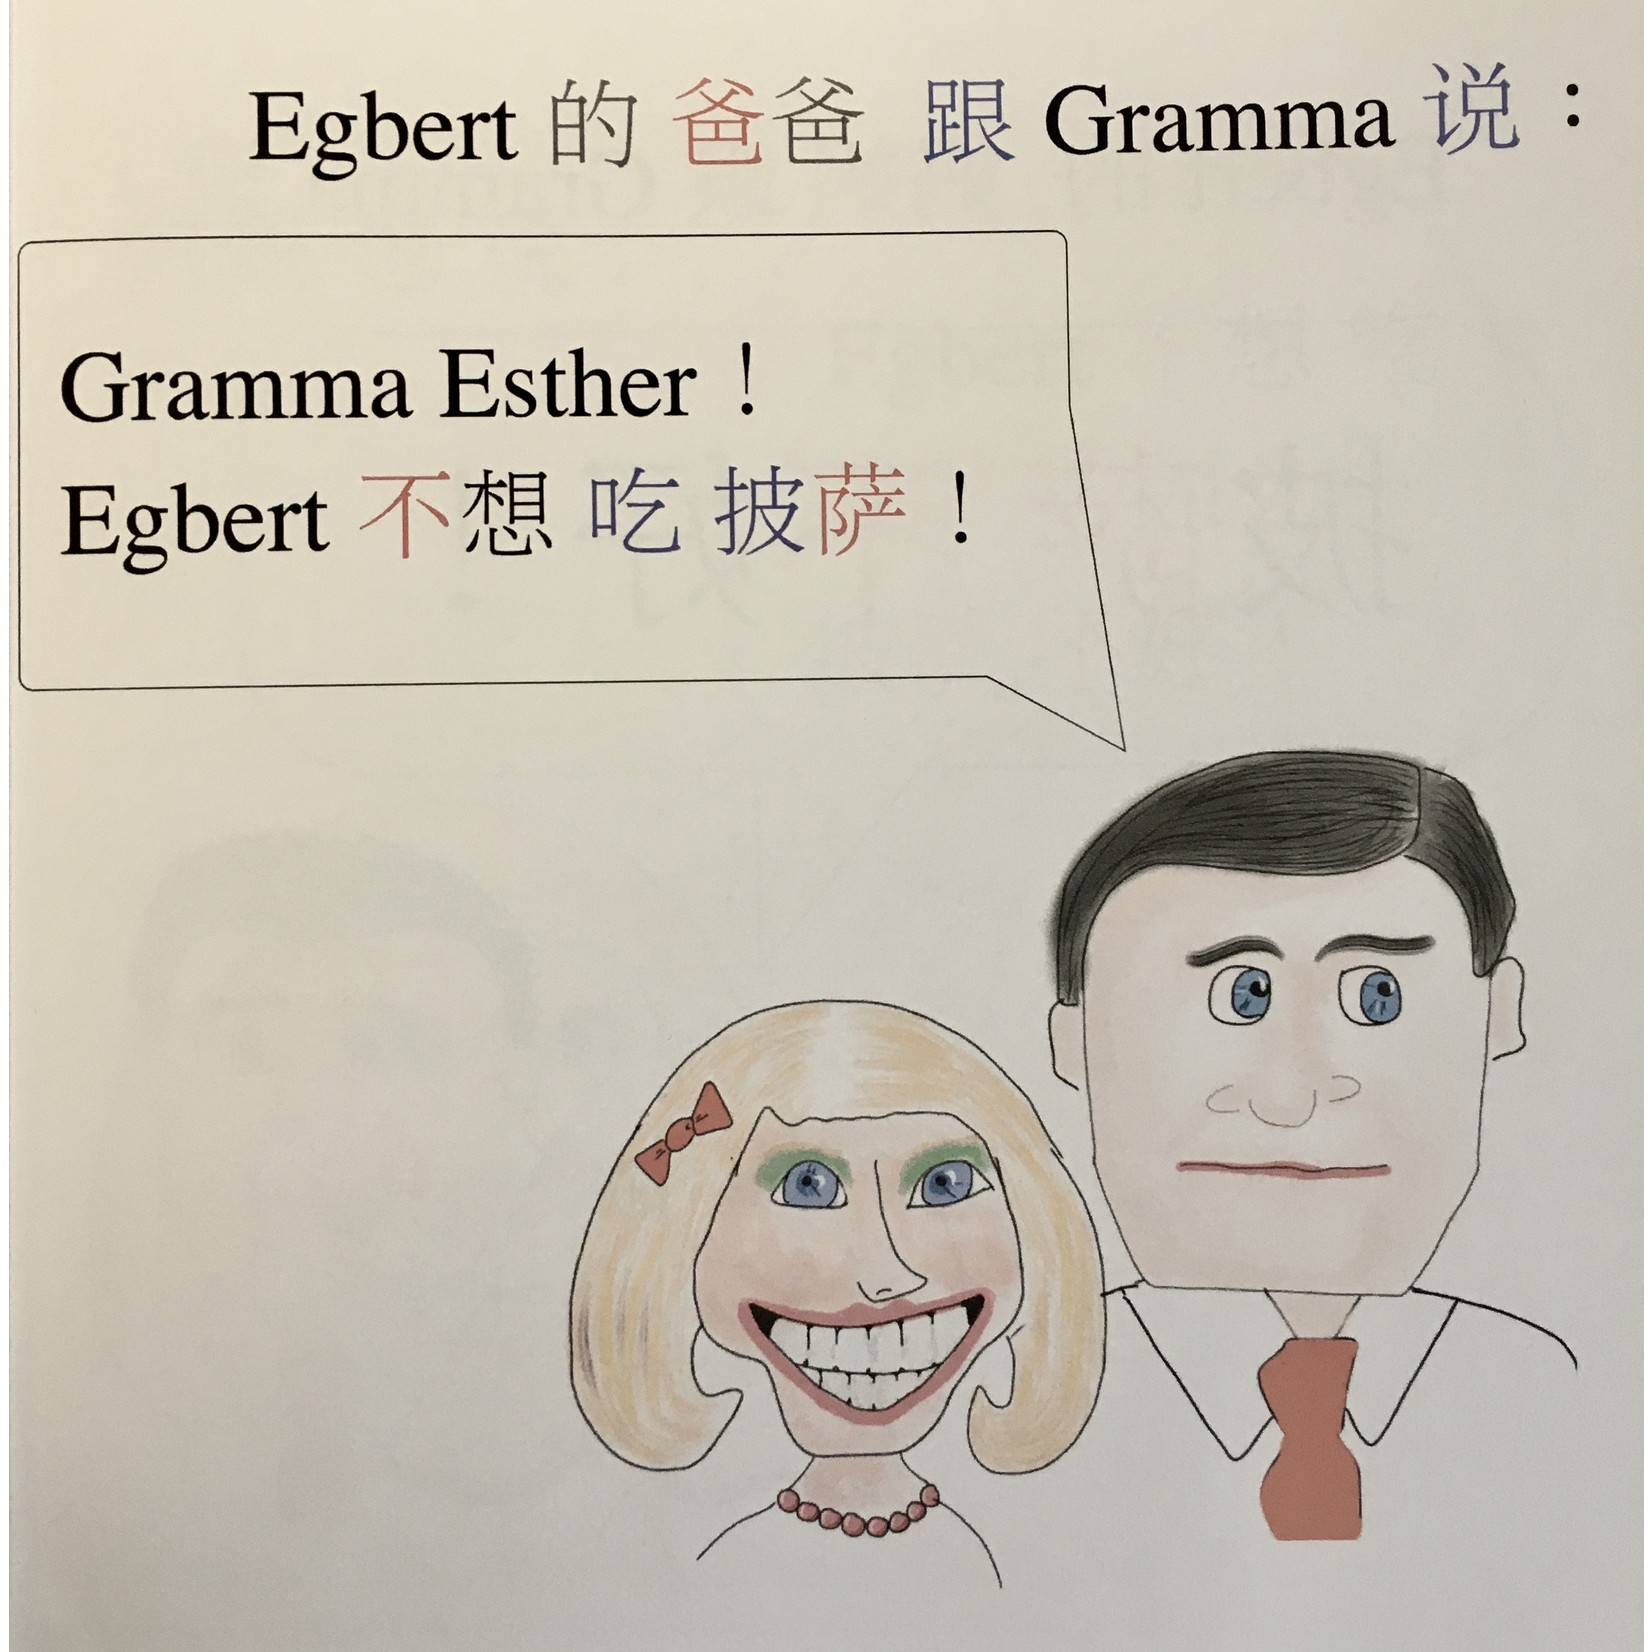 Squid for brains Egbert Weishenme Ku?